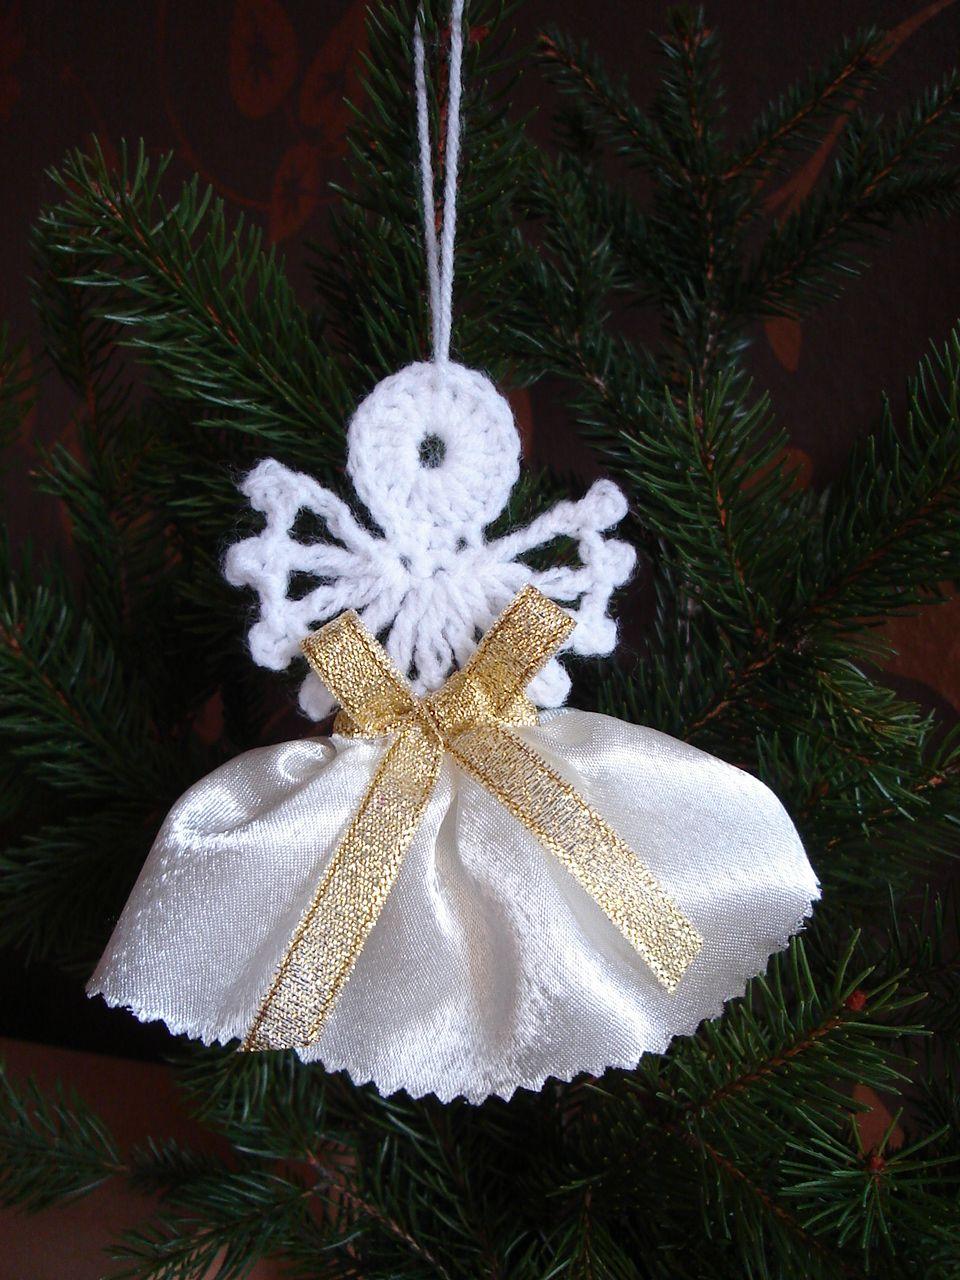 Piekne Szydelkowe Aniolki Aniolek Na Choinke 6615497520 Oficjalne Archiwum Allegro Christmas Crochet Holiday Decor Christmas